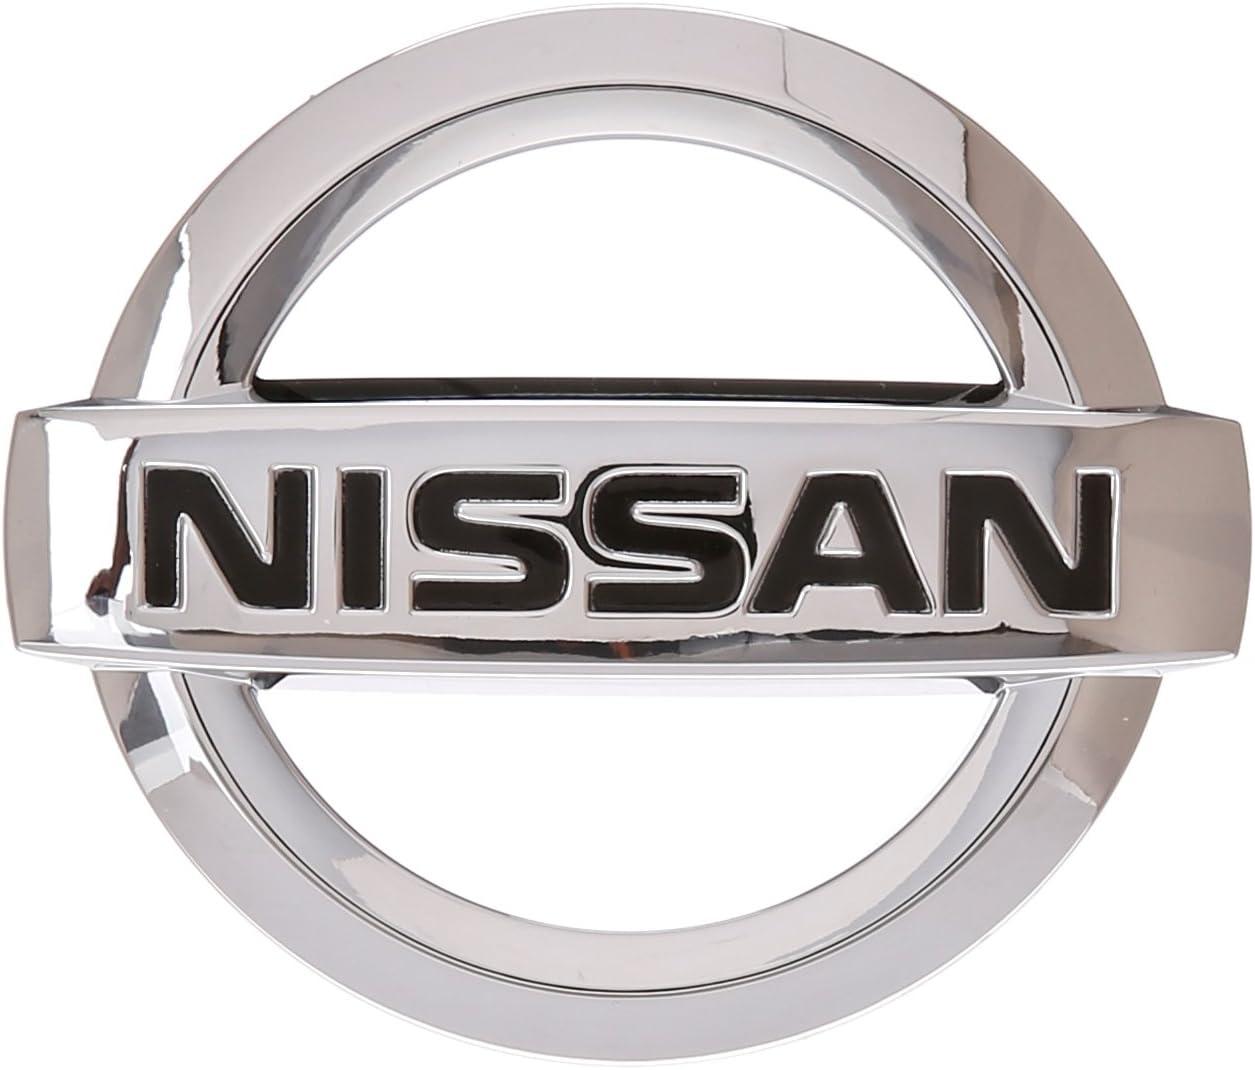 Nissan Genuine 84890-JA000 Emblem